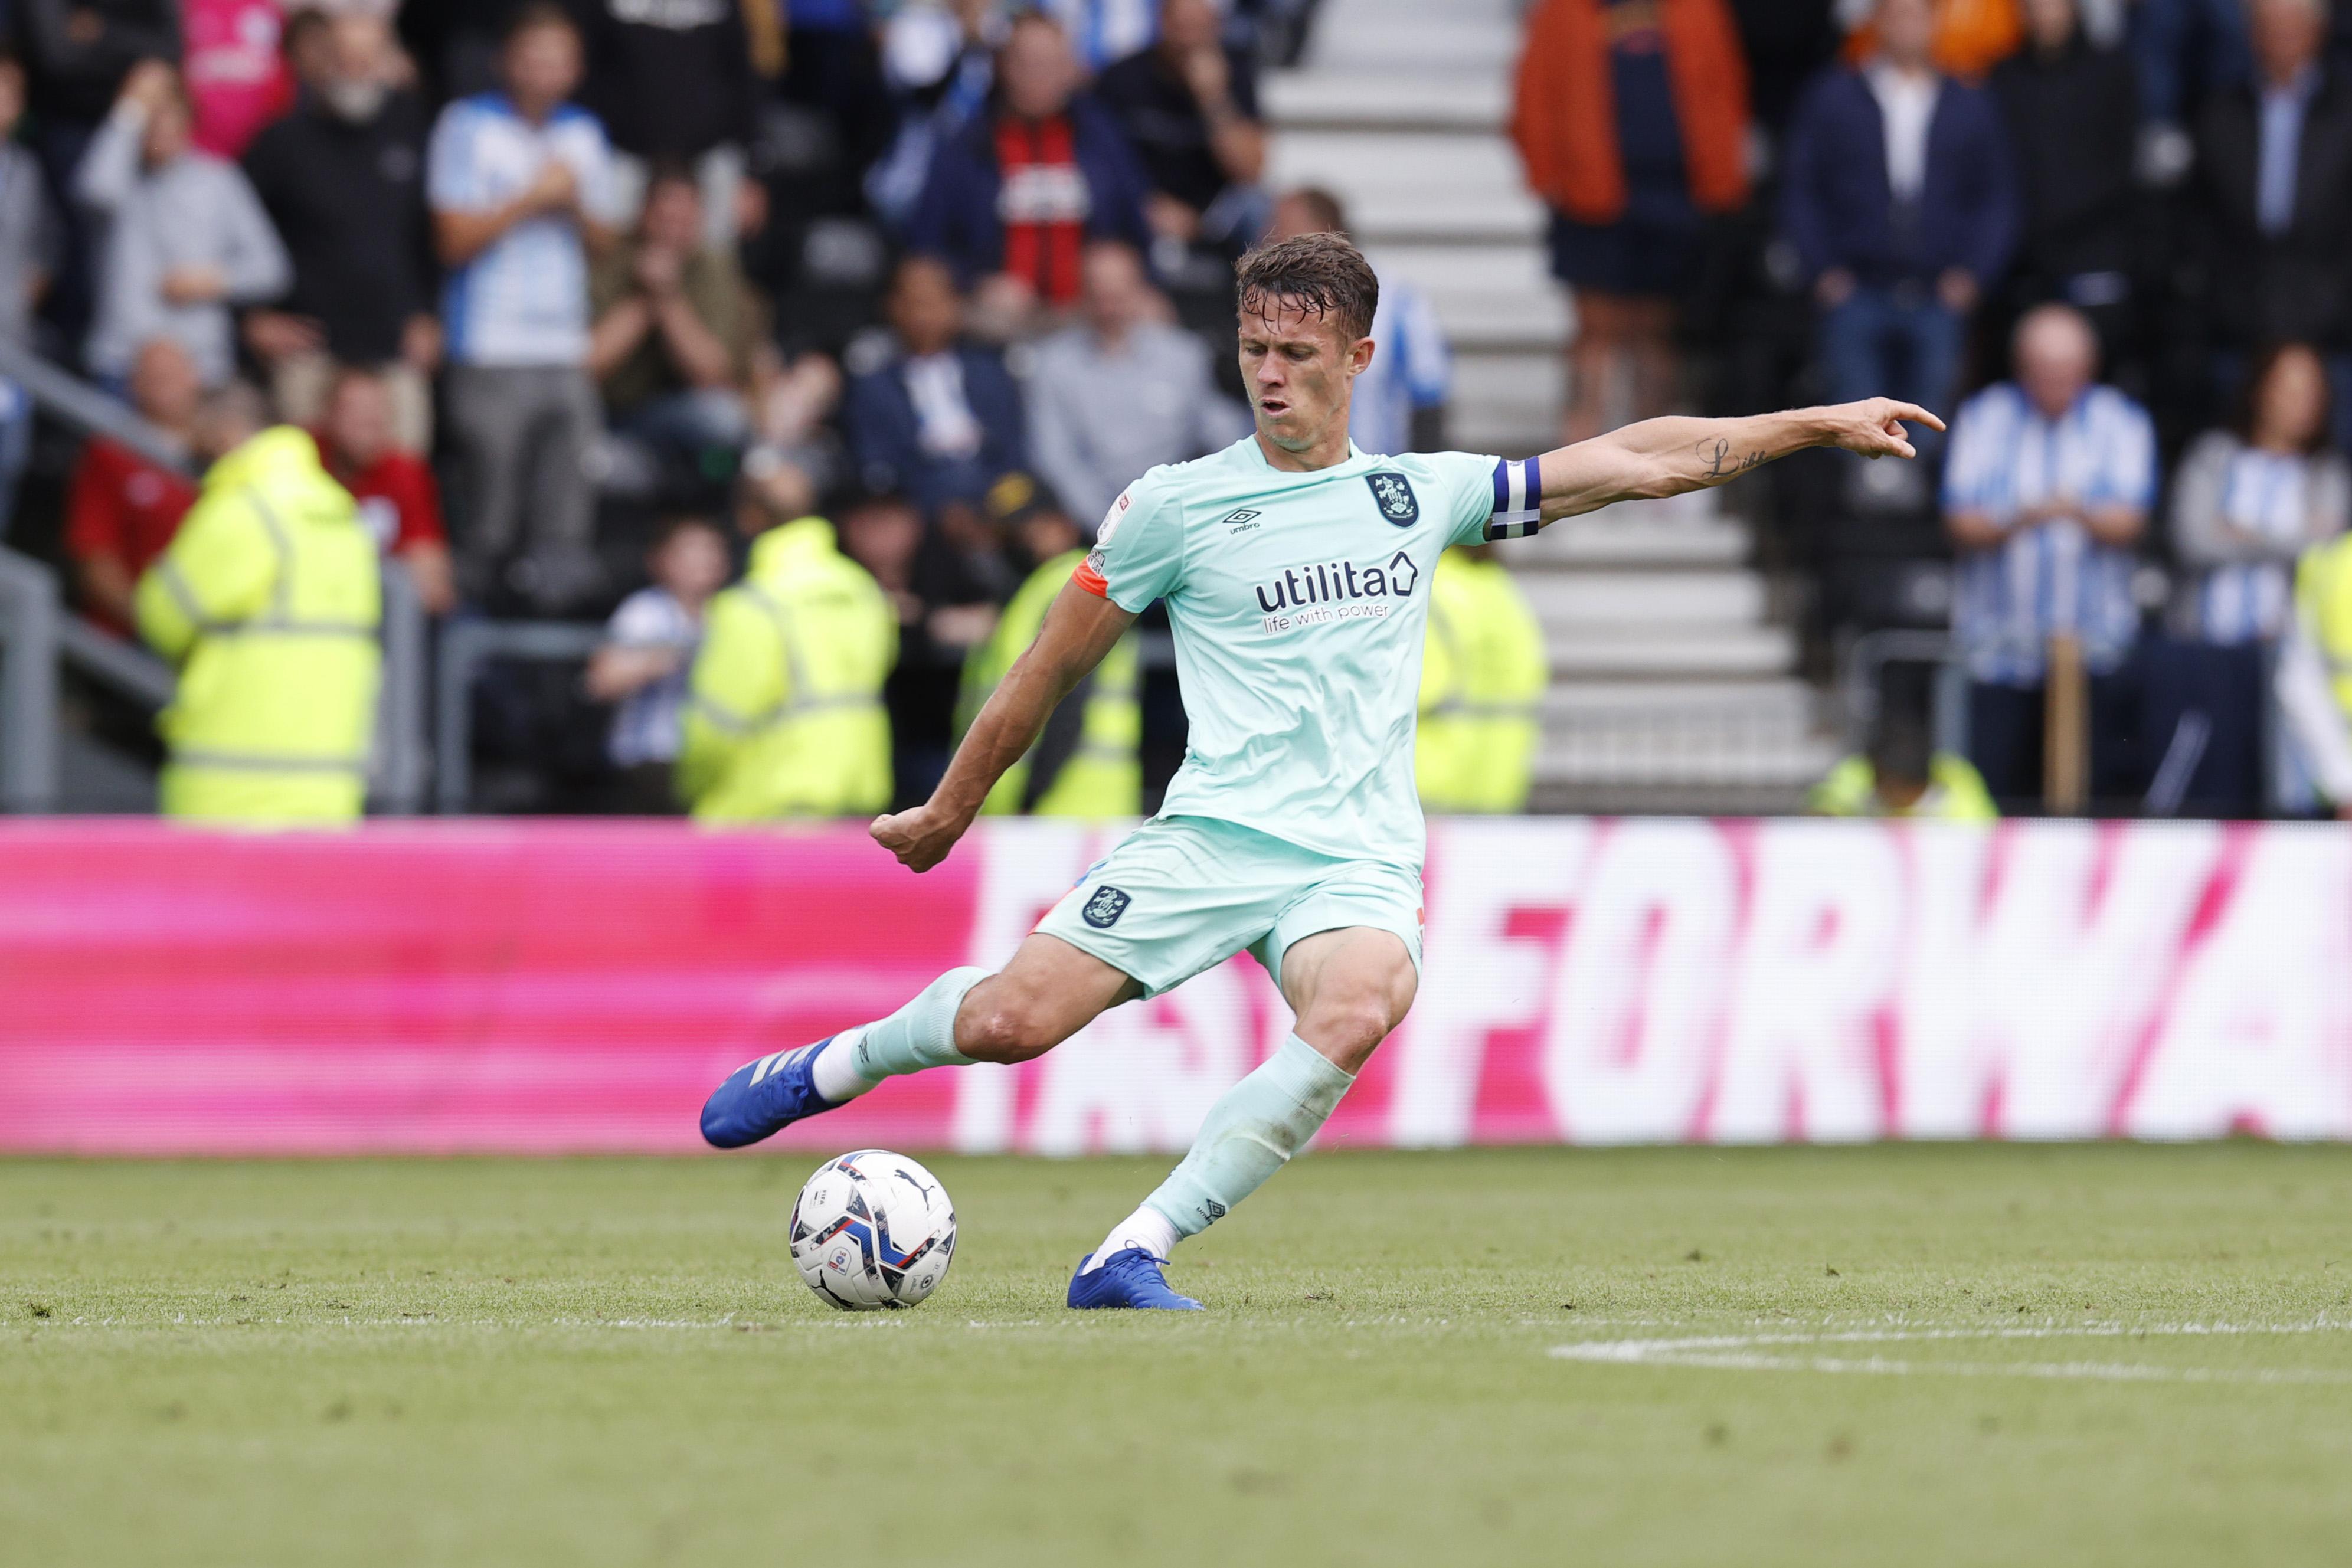 Derby County v Huddersfield Town - Sky Bet Championship